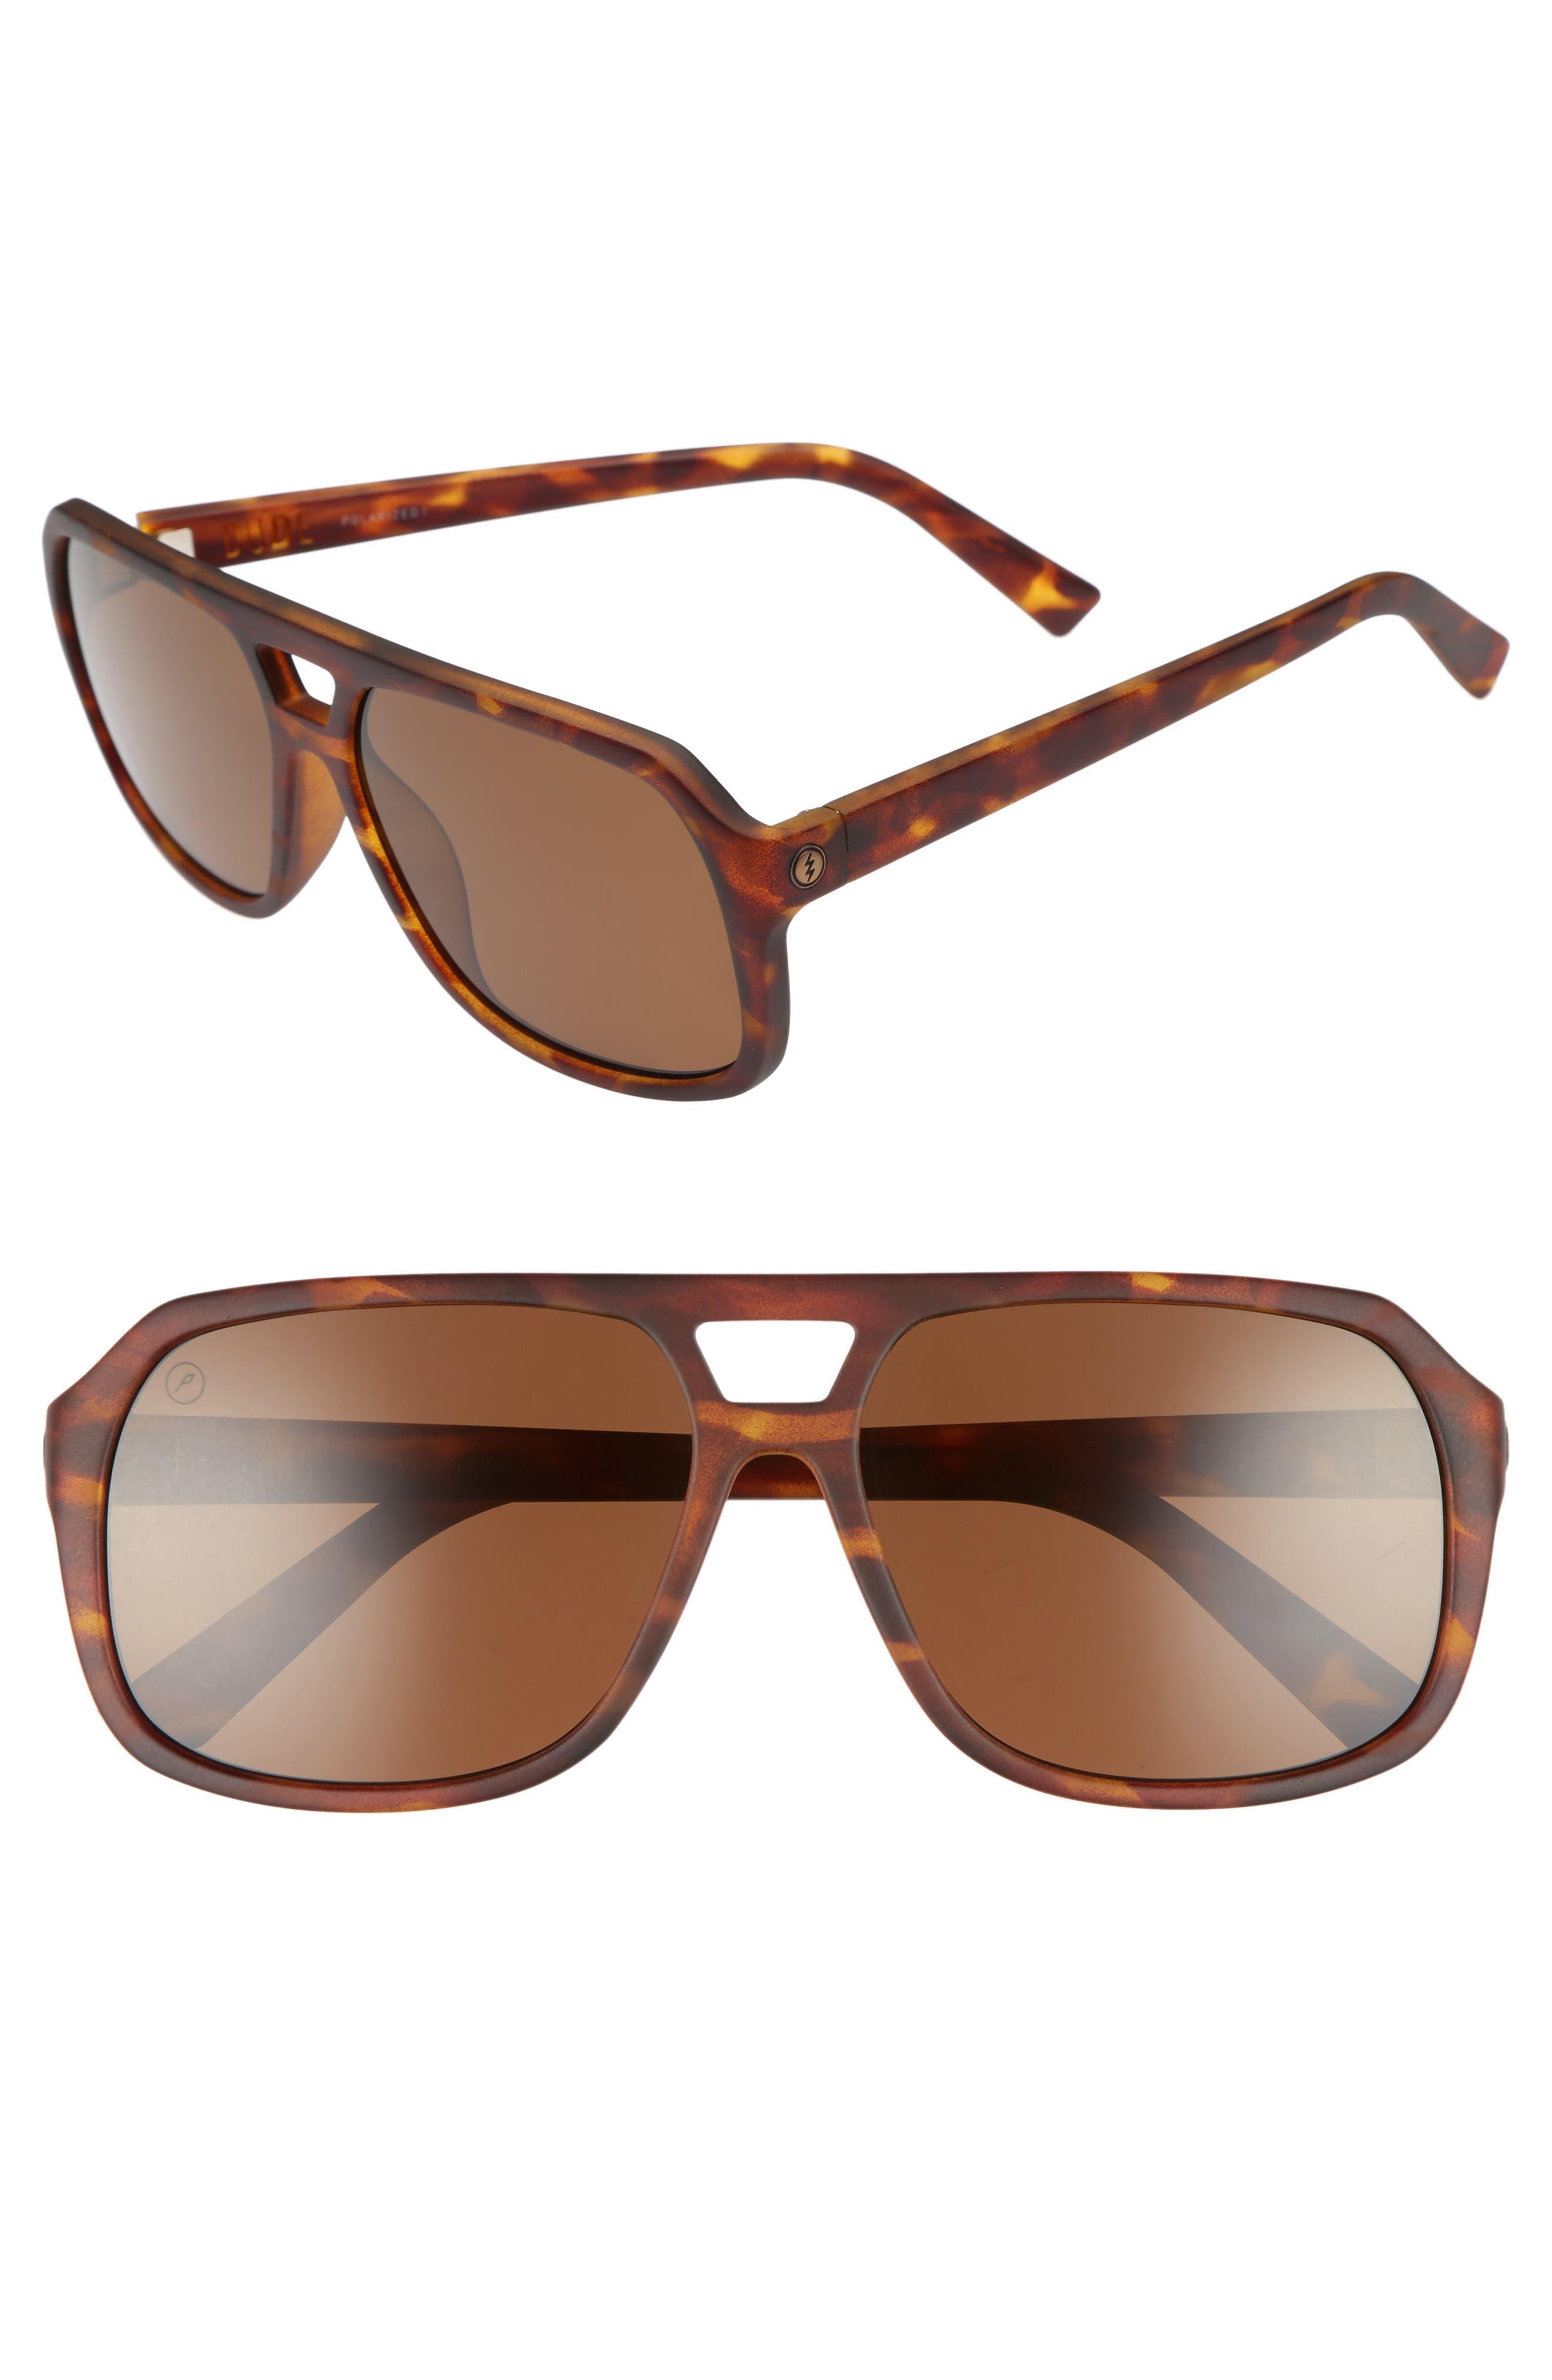 Main Image - ELECTRIC Dude 59mm Polarized Sunglasses